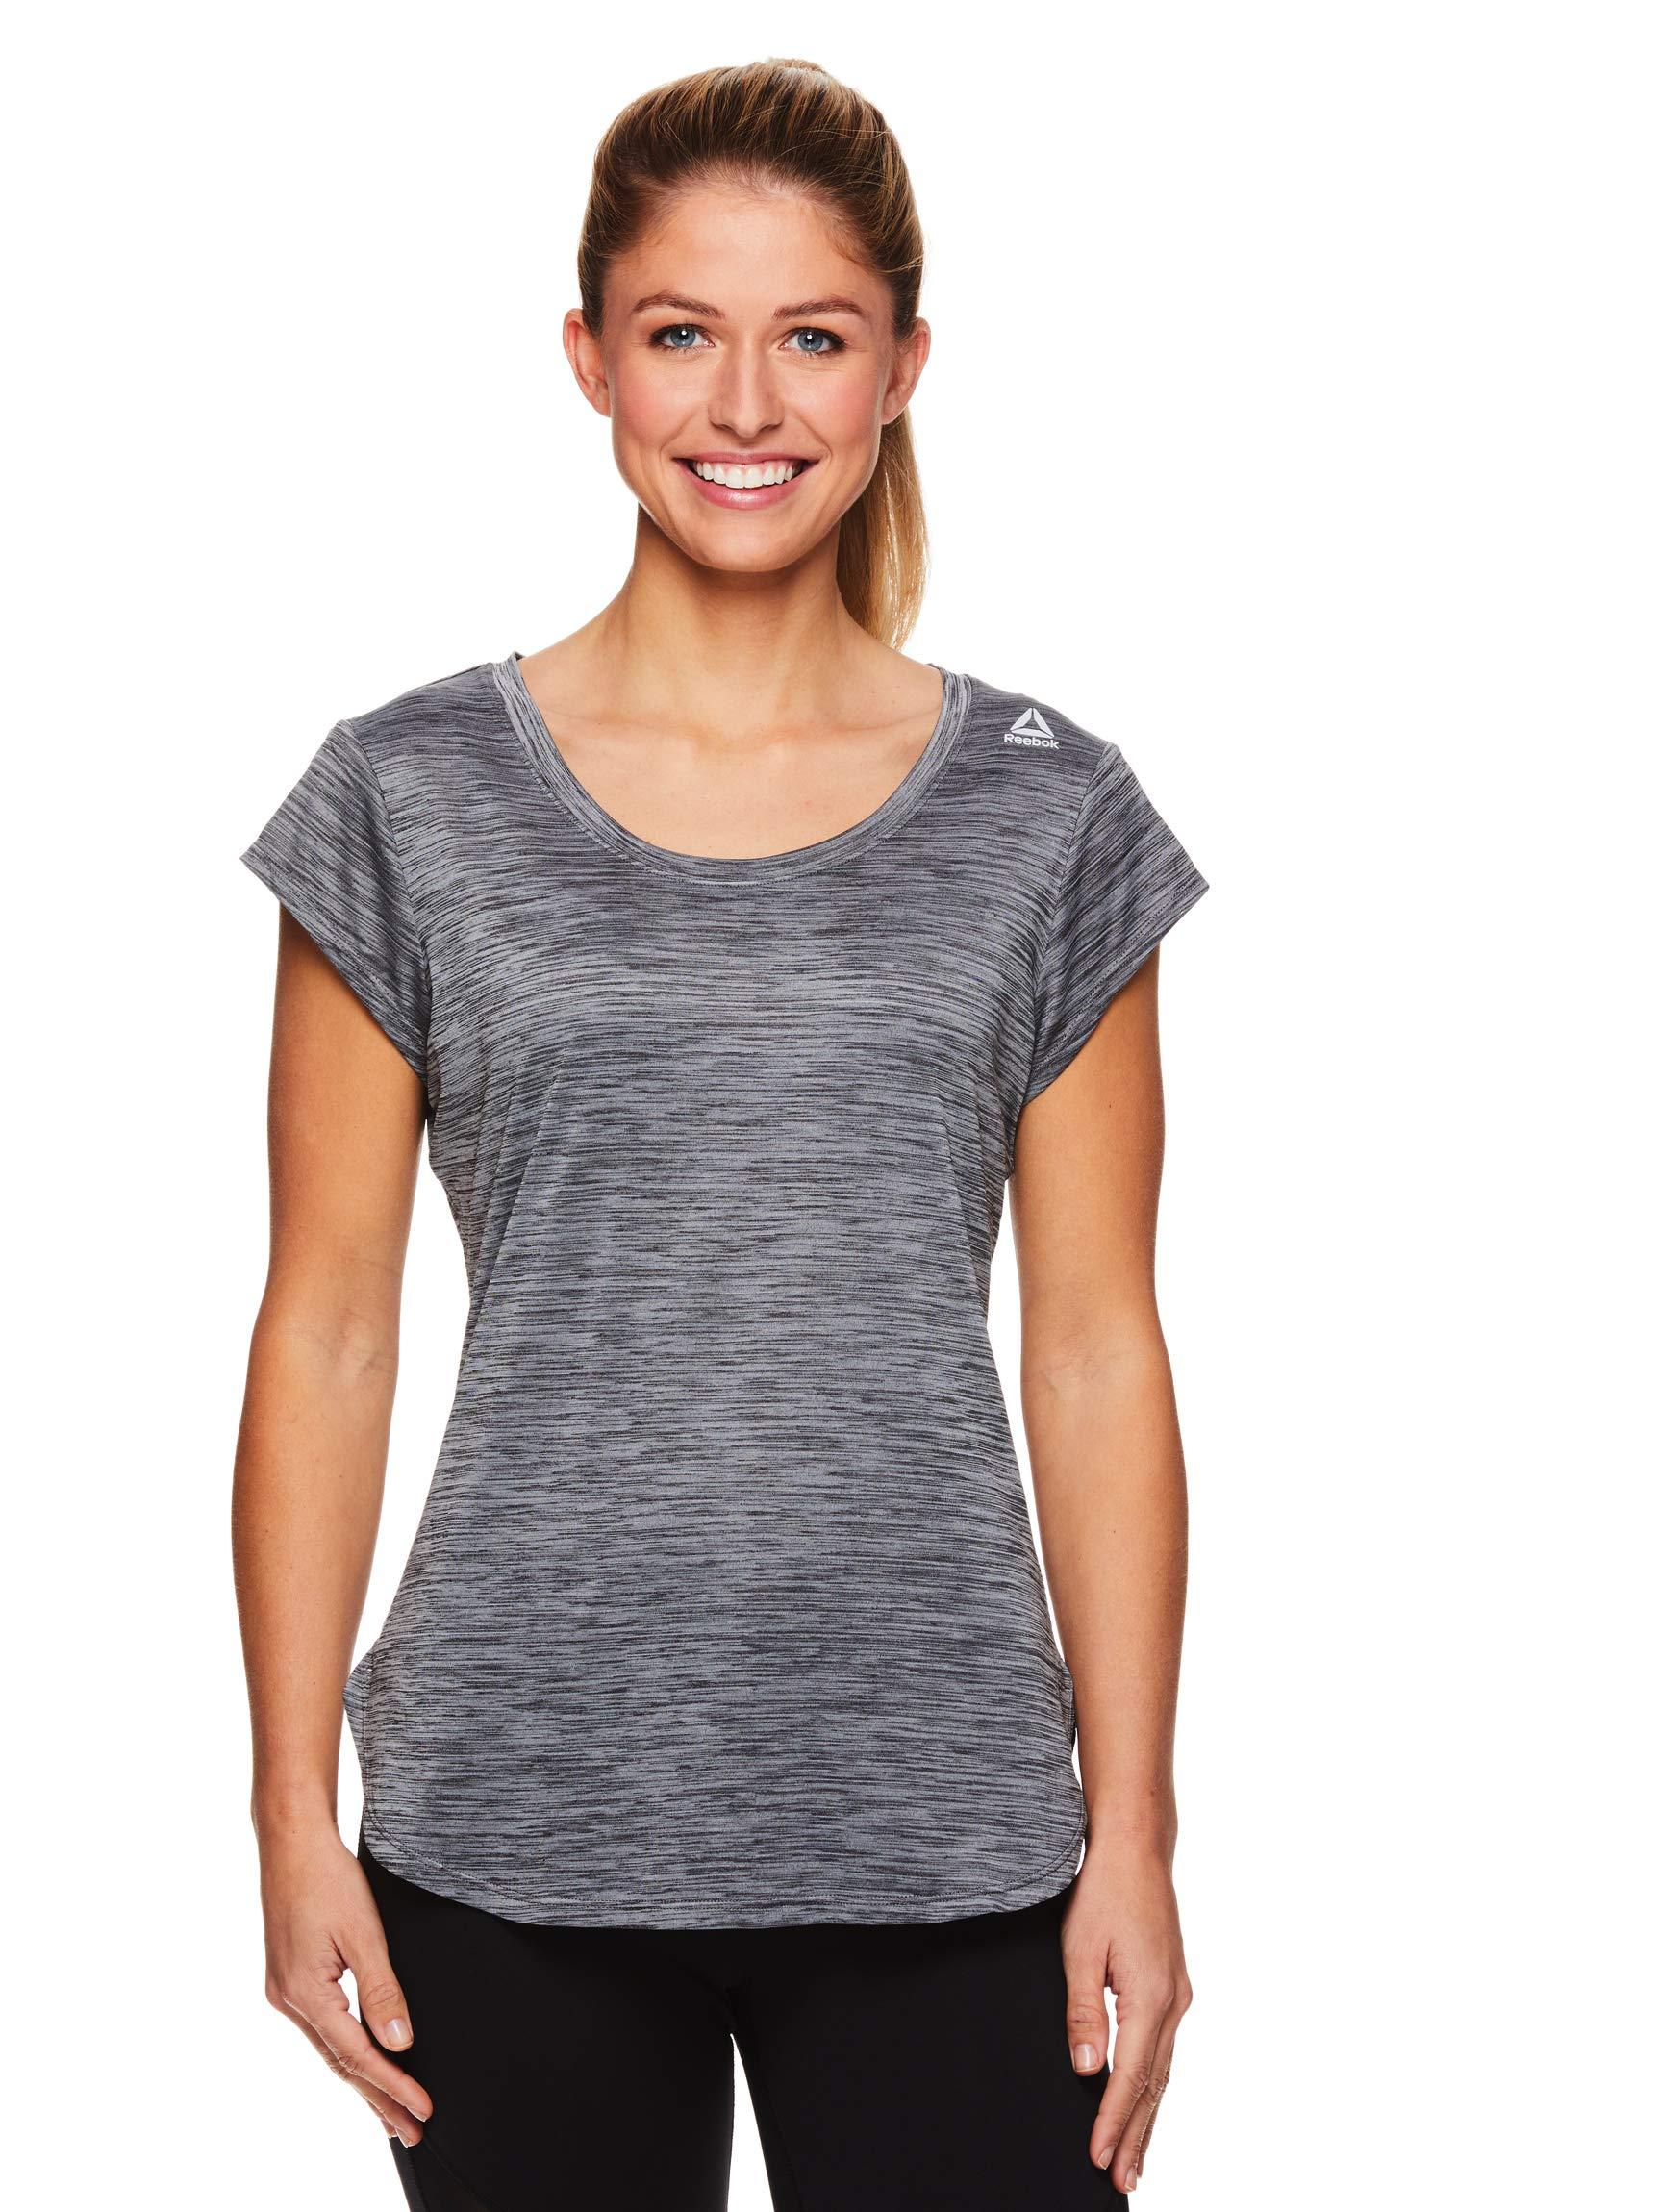 Reebok Women's Legend Performance Short Sleeve T-Shirt with Polyspan Fabric - Black Black Heather, X-Small